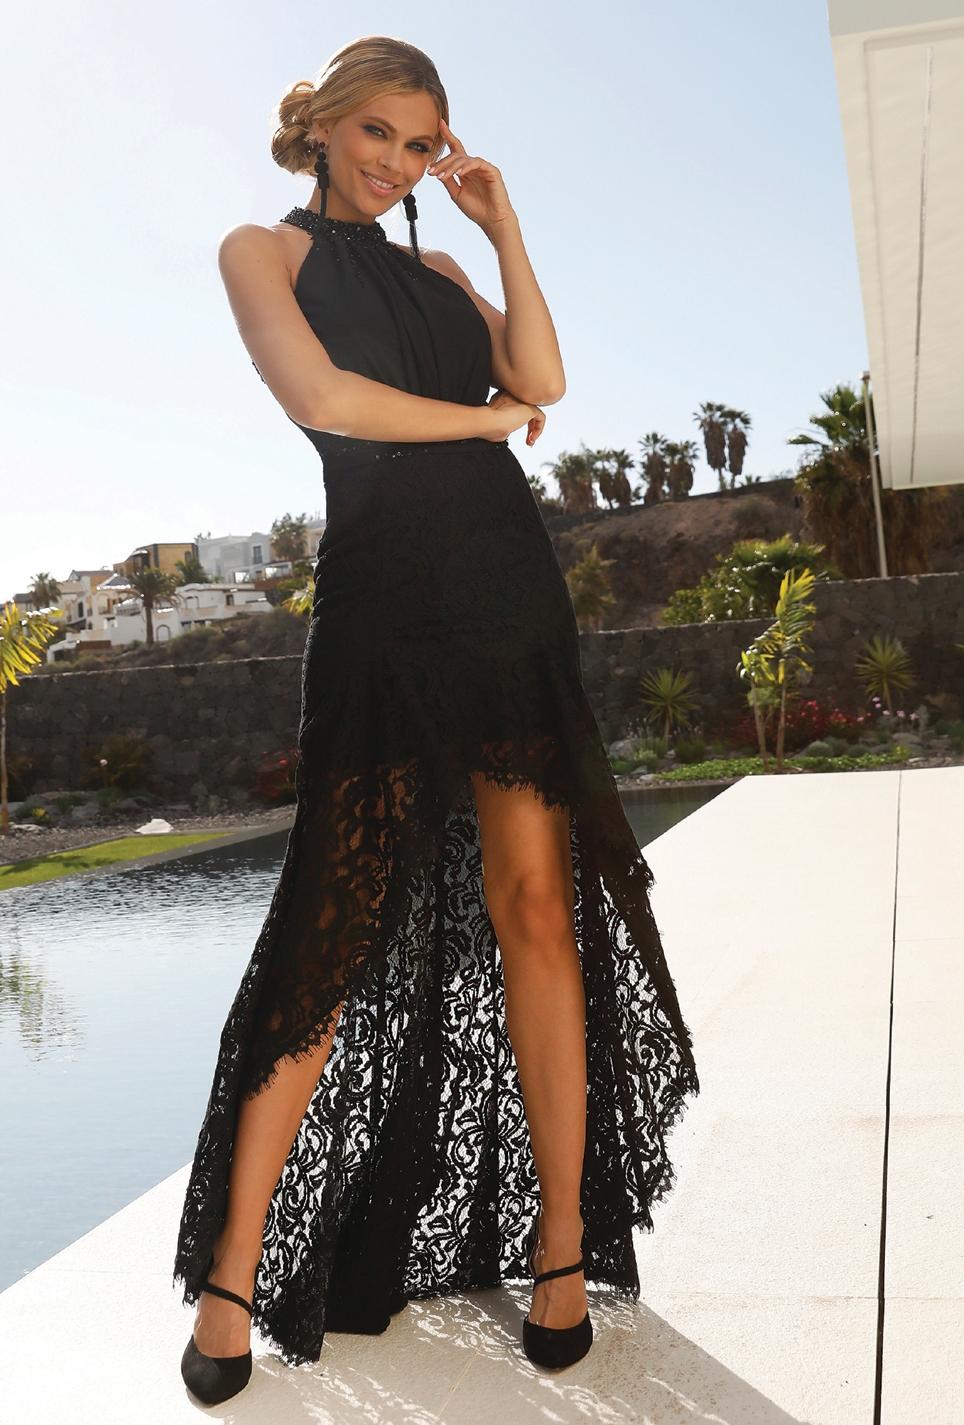 Cocktailkleed kort-lang Linea Raffaelli - Tenerife 19-20 - Set 487 - 191-908-01cr